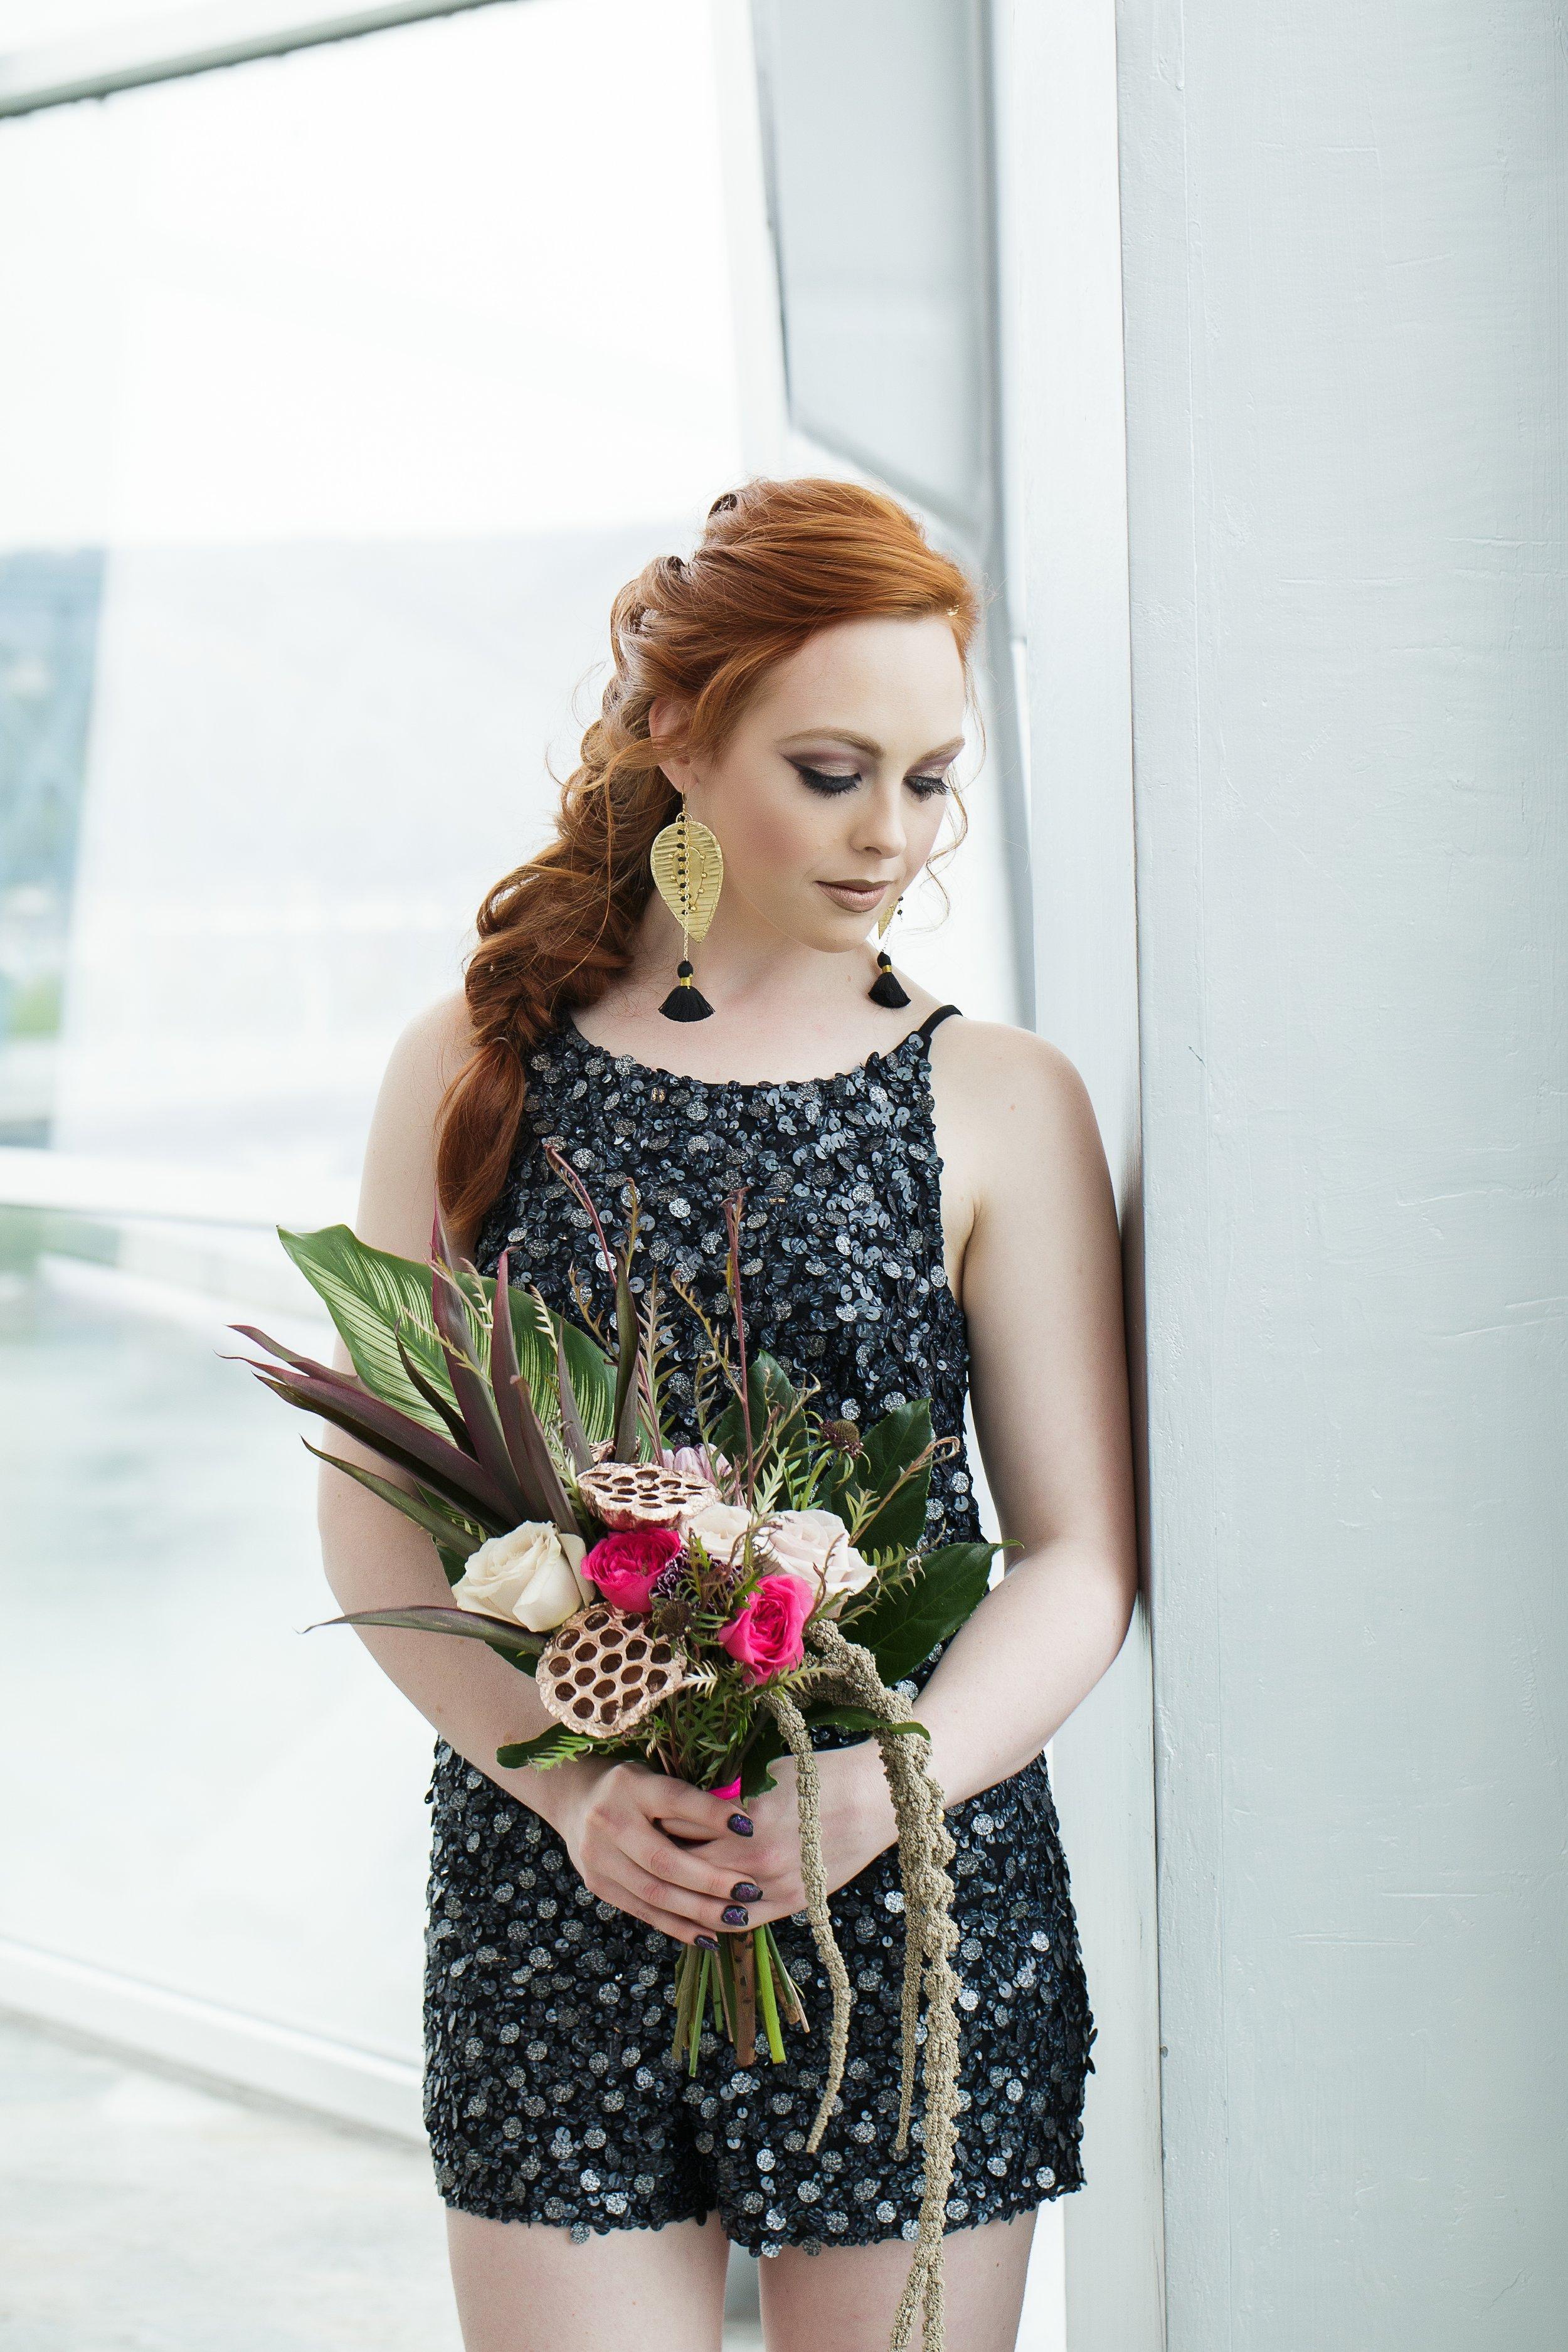 Fox-and-Fern-Bridesmaid-Bouquet-2050-Styled-Shoot-003.jpg